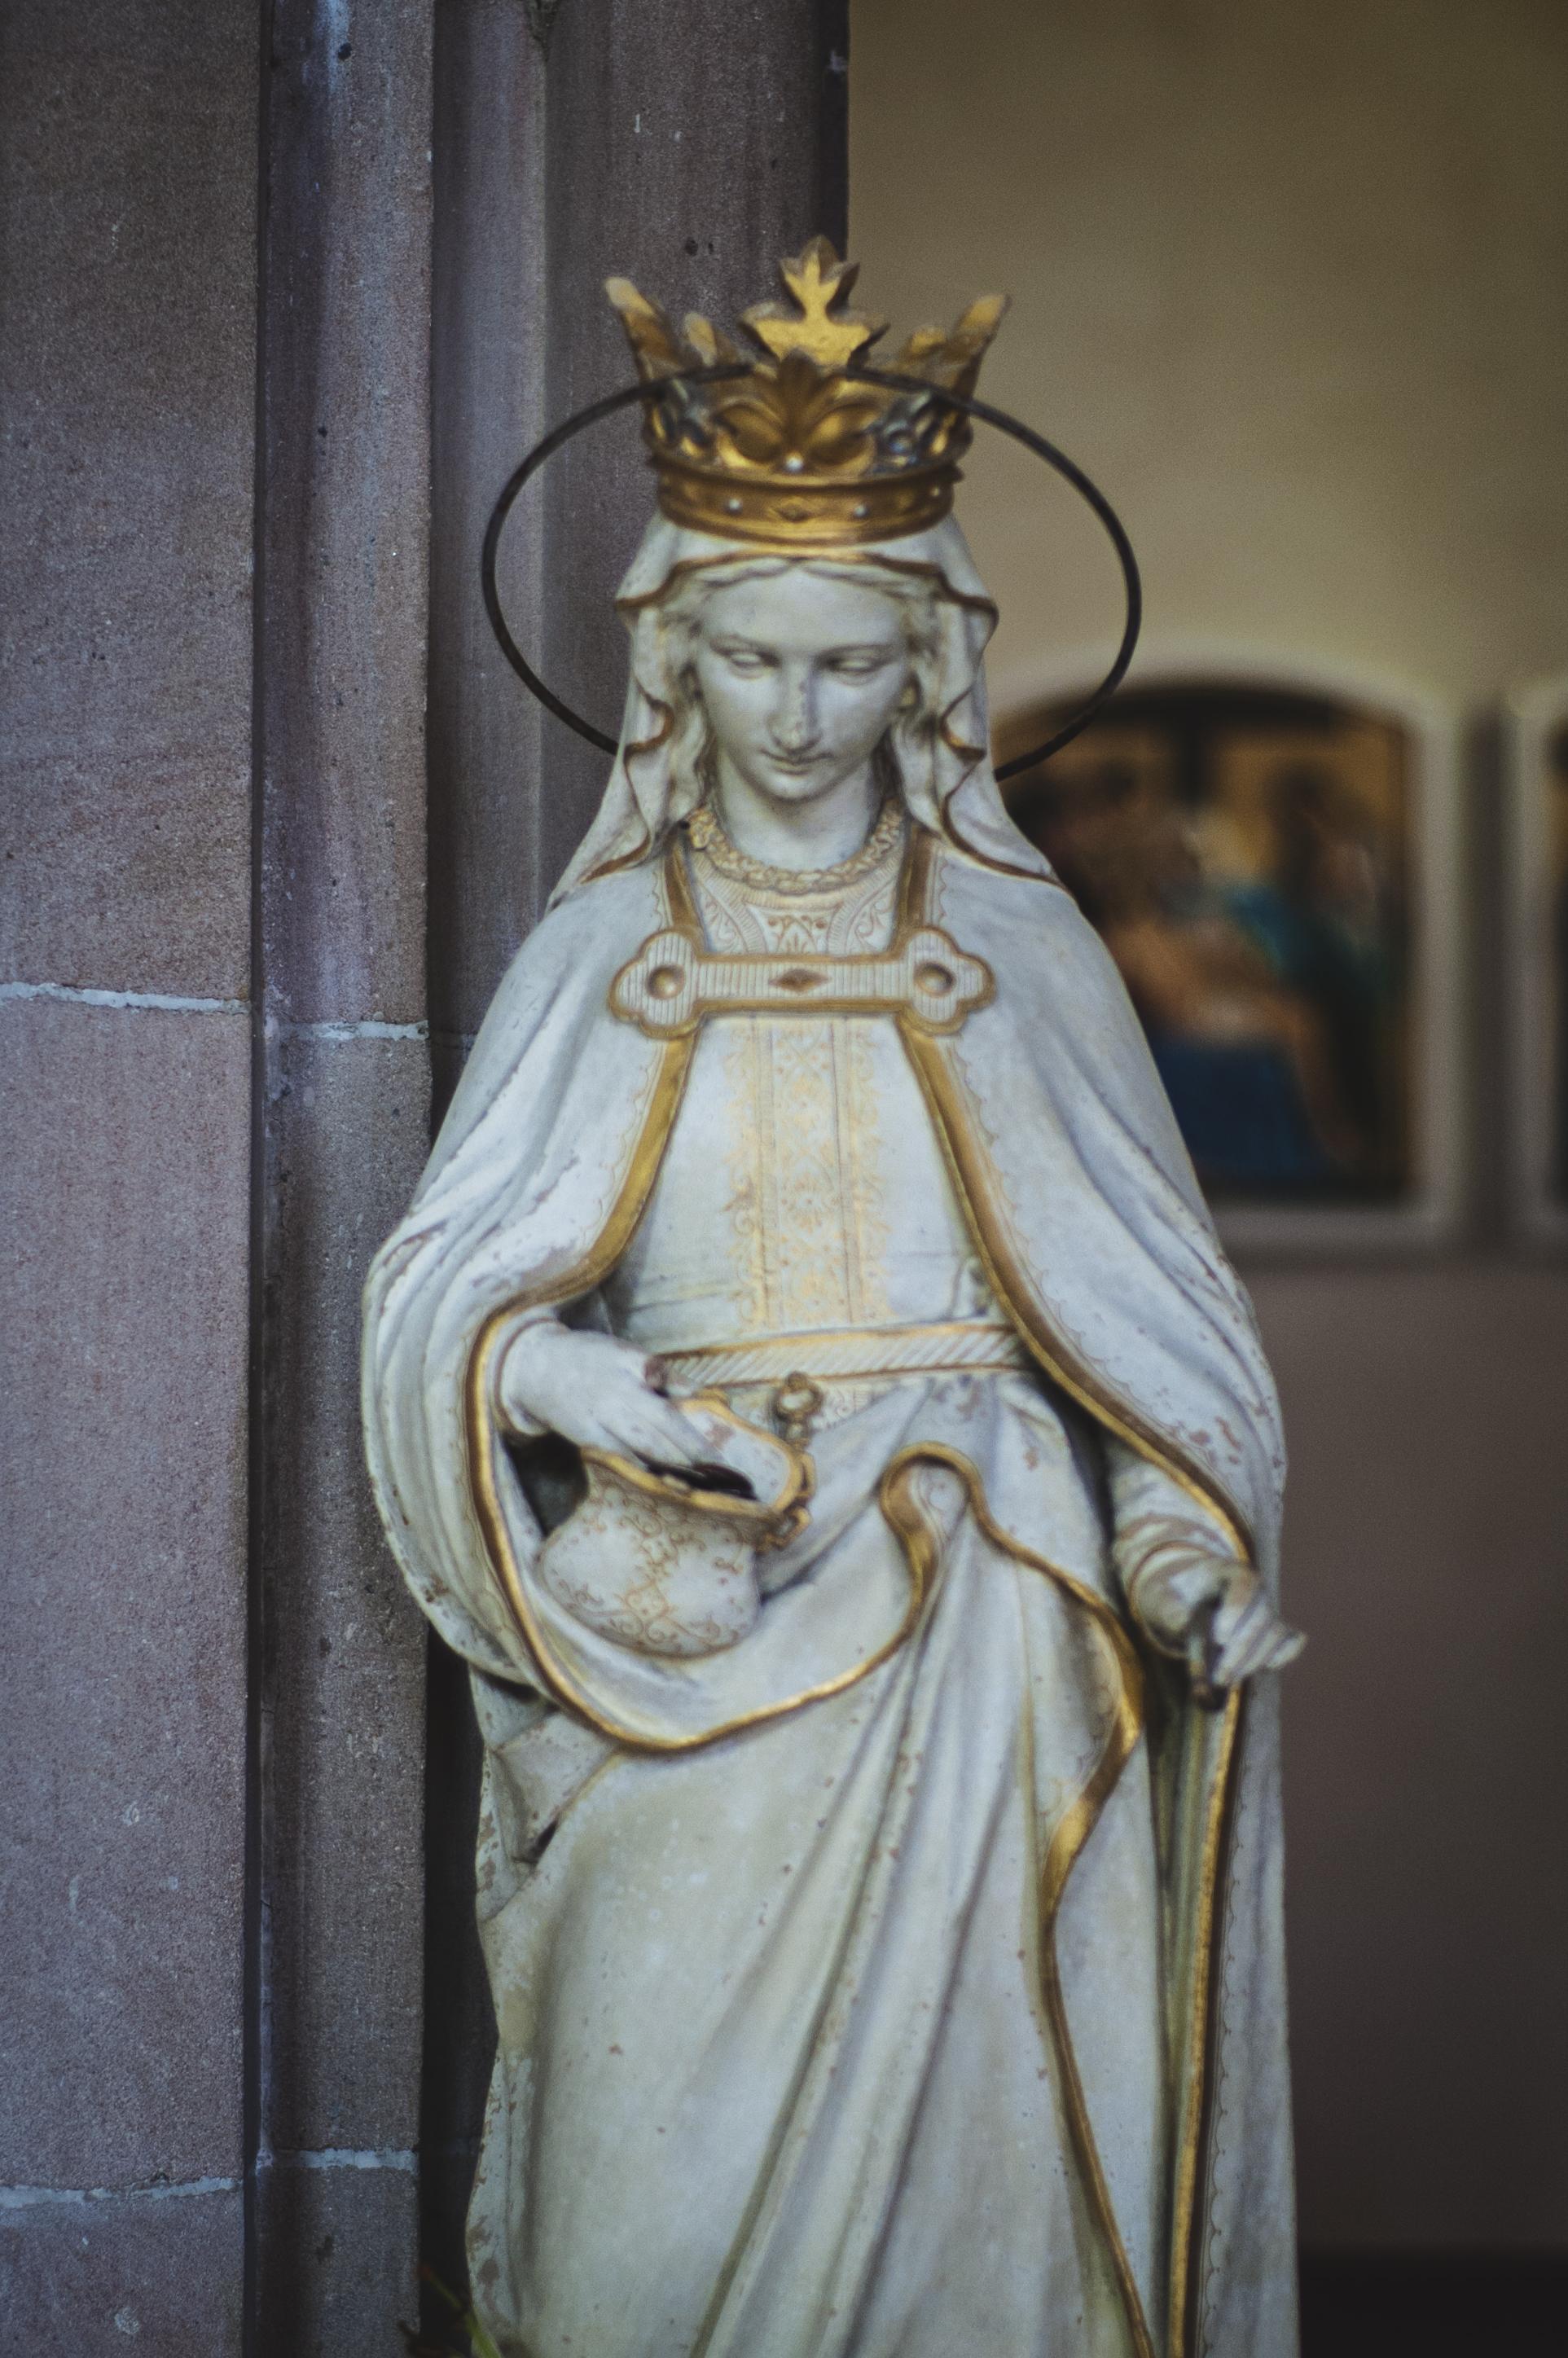 Inside the beautiful Church of St Mary & St Finnan